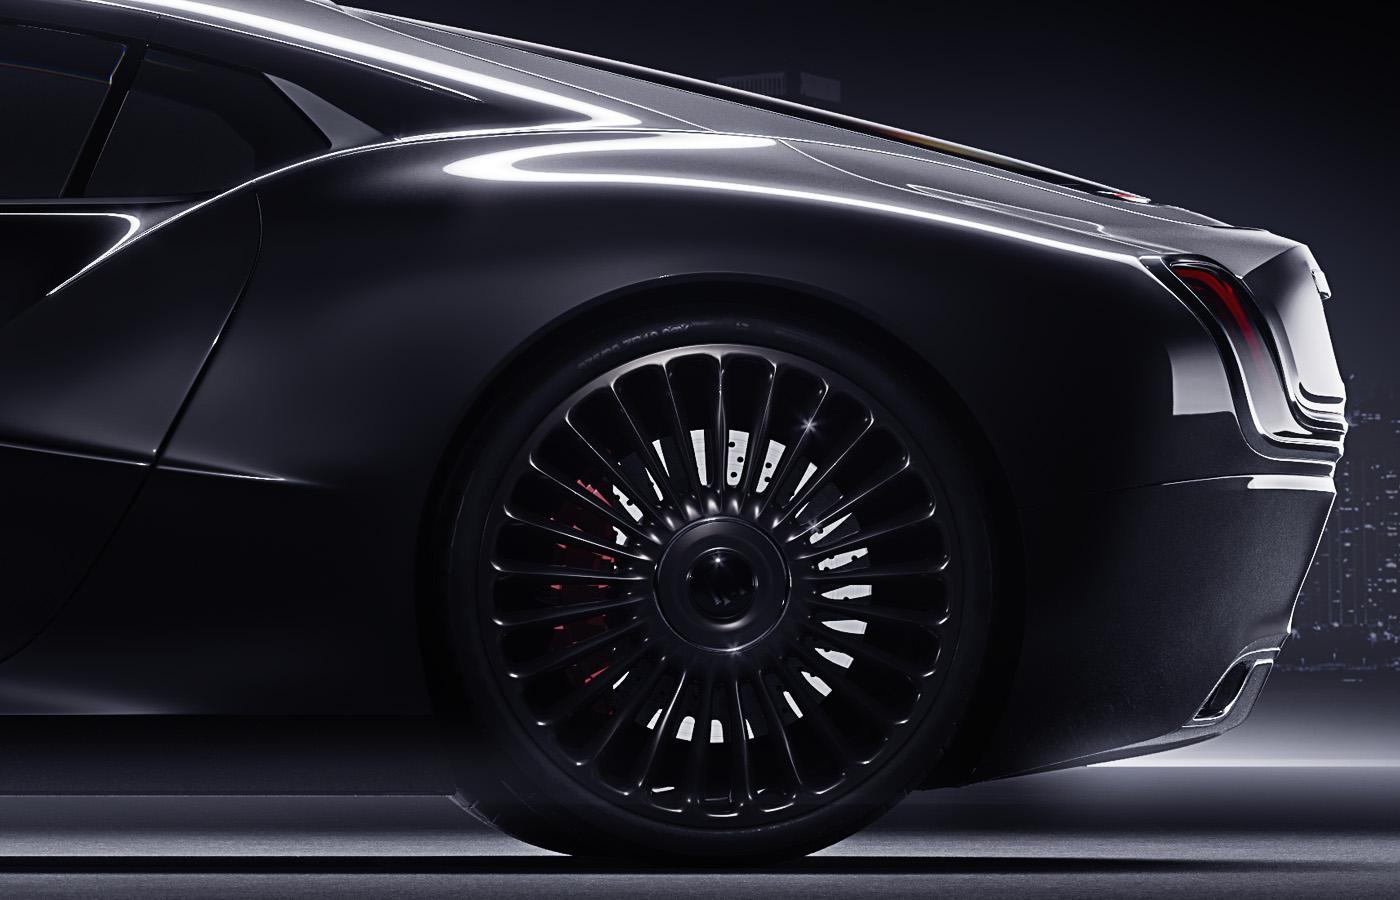 Rolls Royce luxury automotive design 4 2.jpg